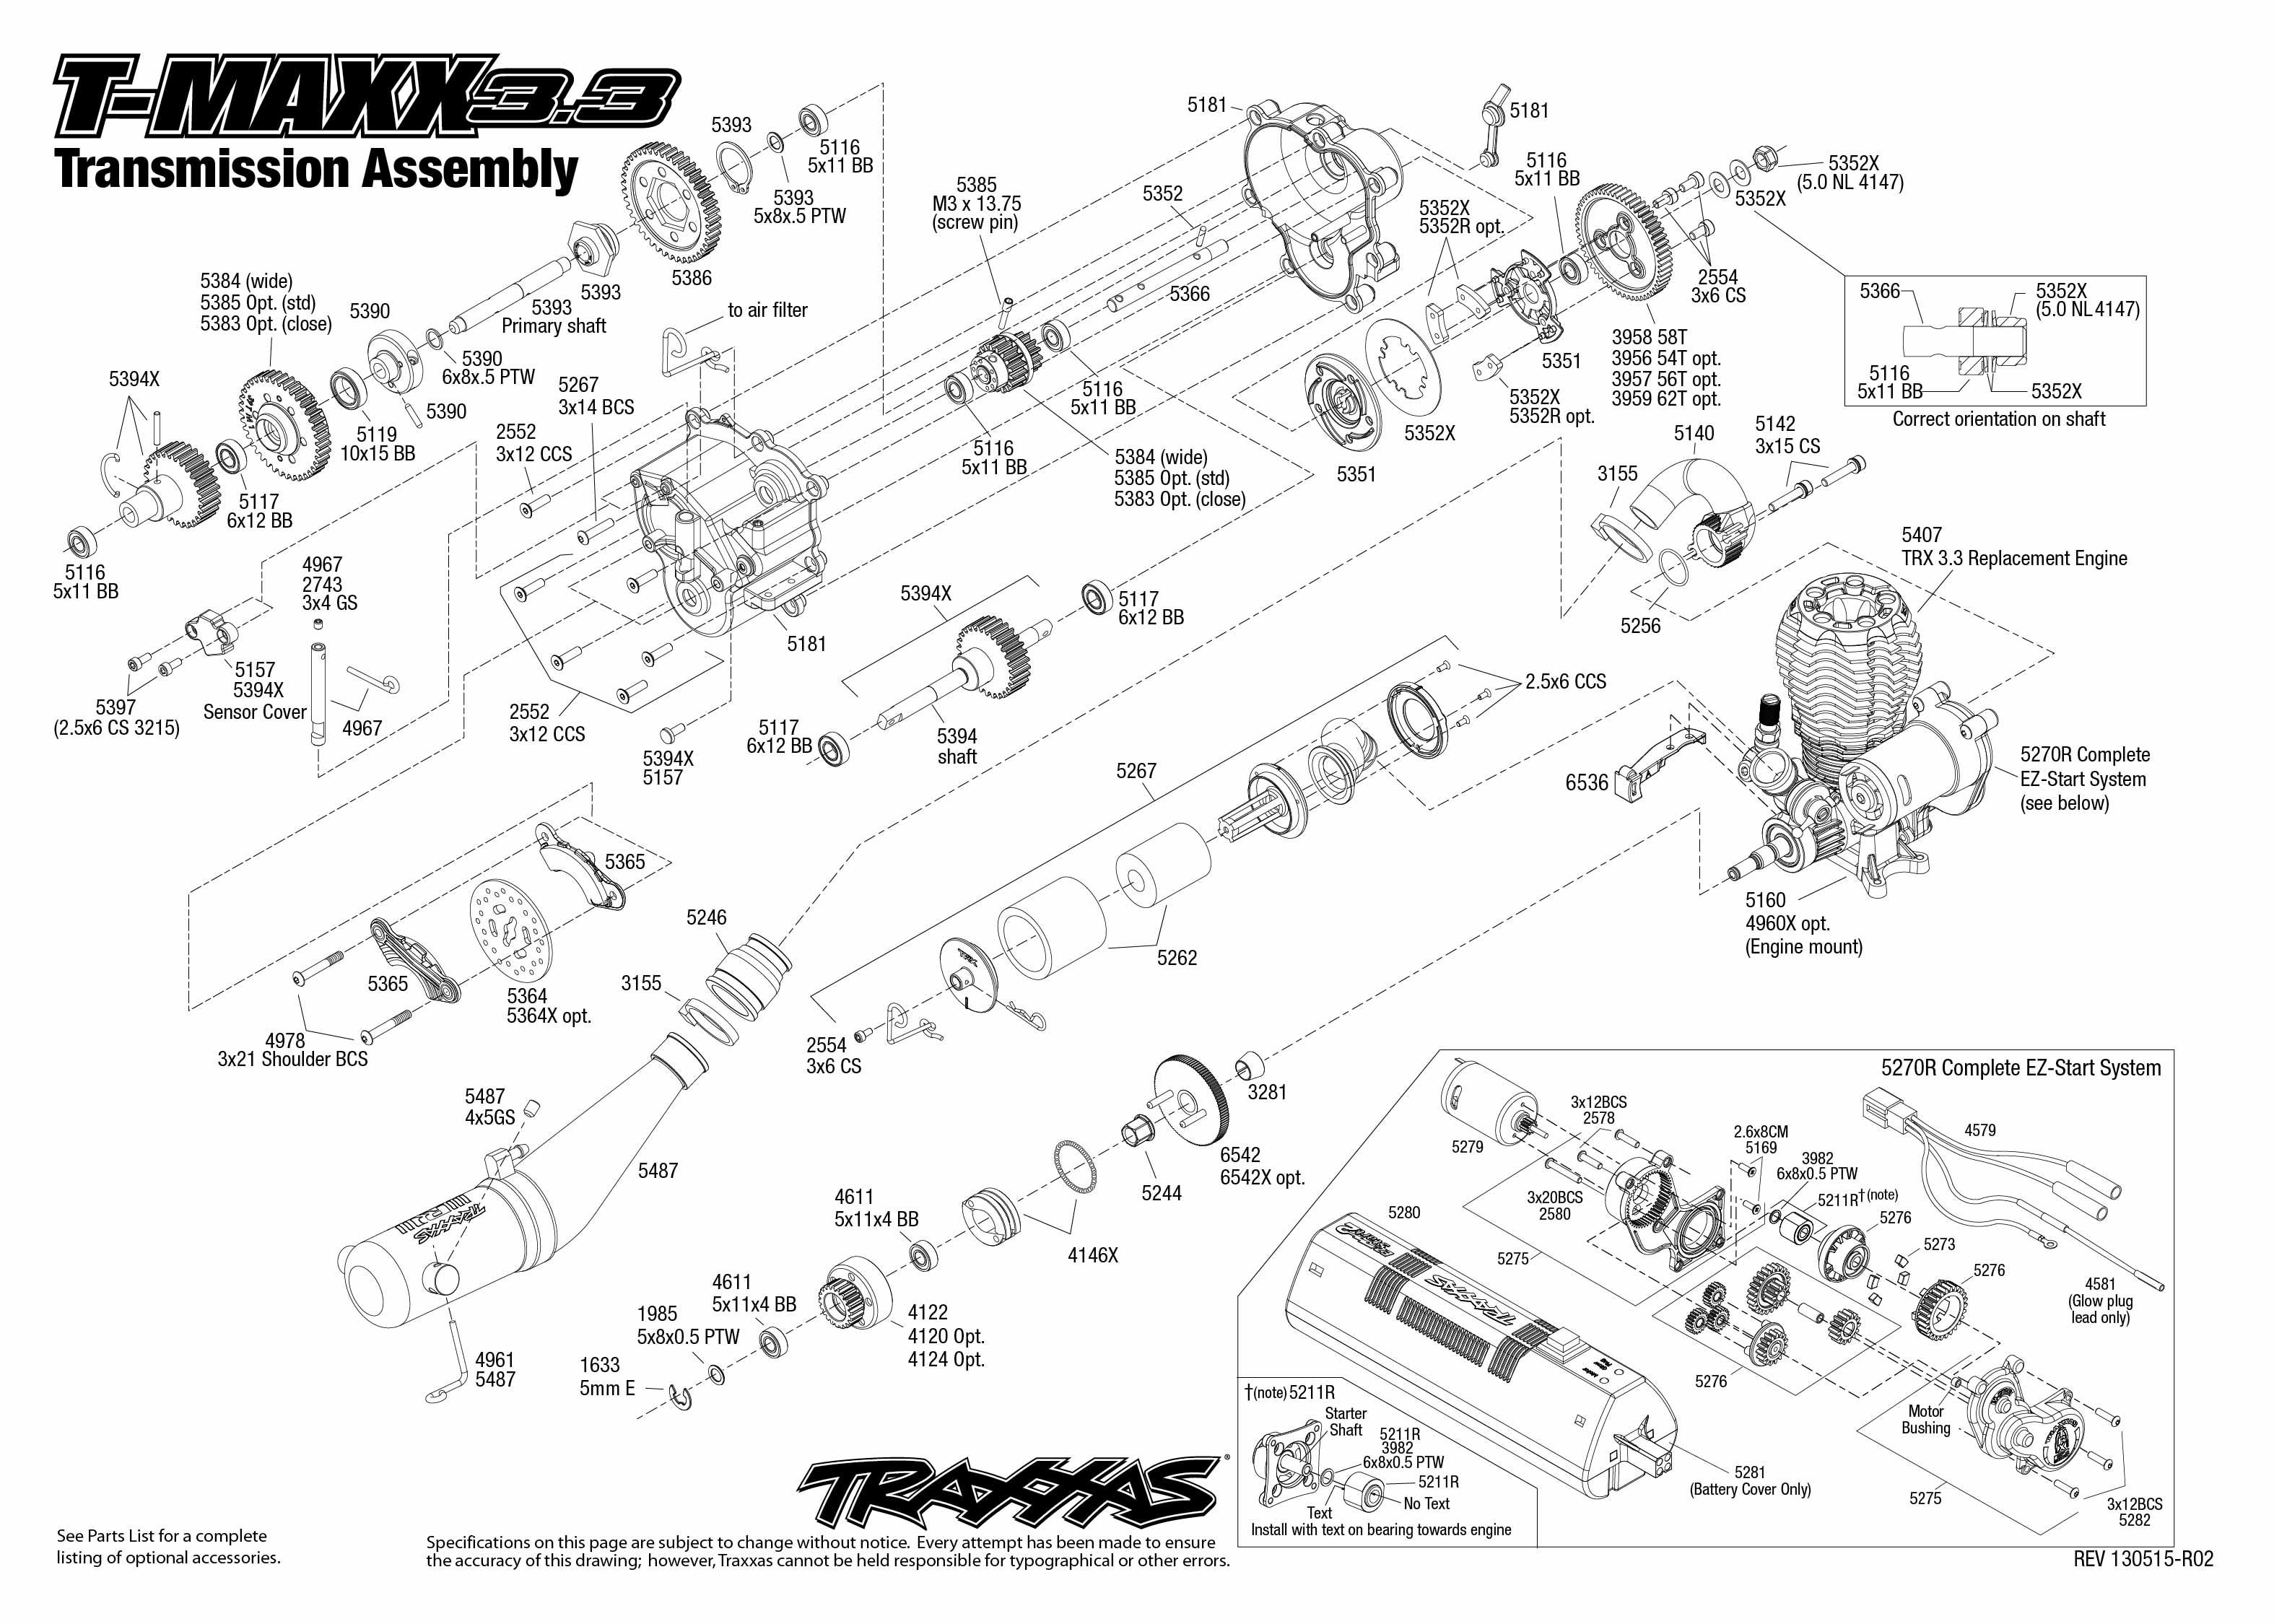 traxxas t maxx 2 5 transmission diagram off grid solar system wiring australia free engine